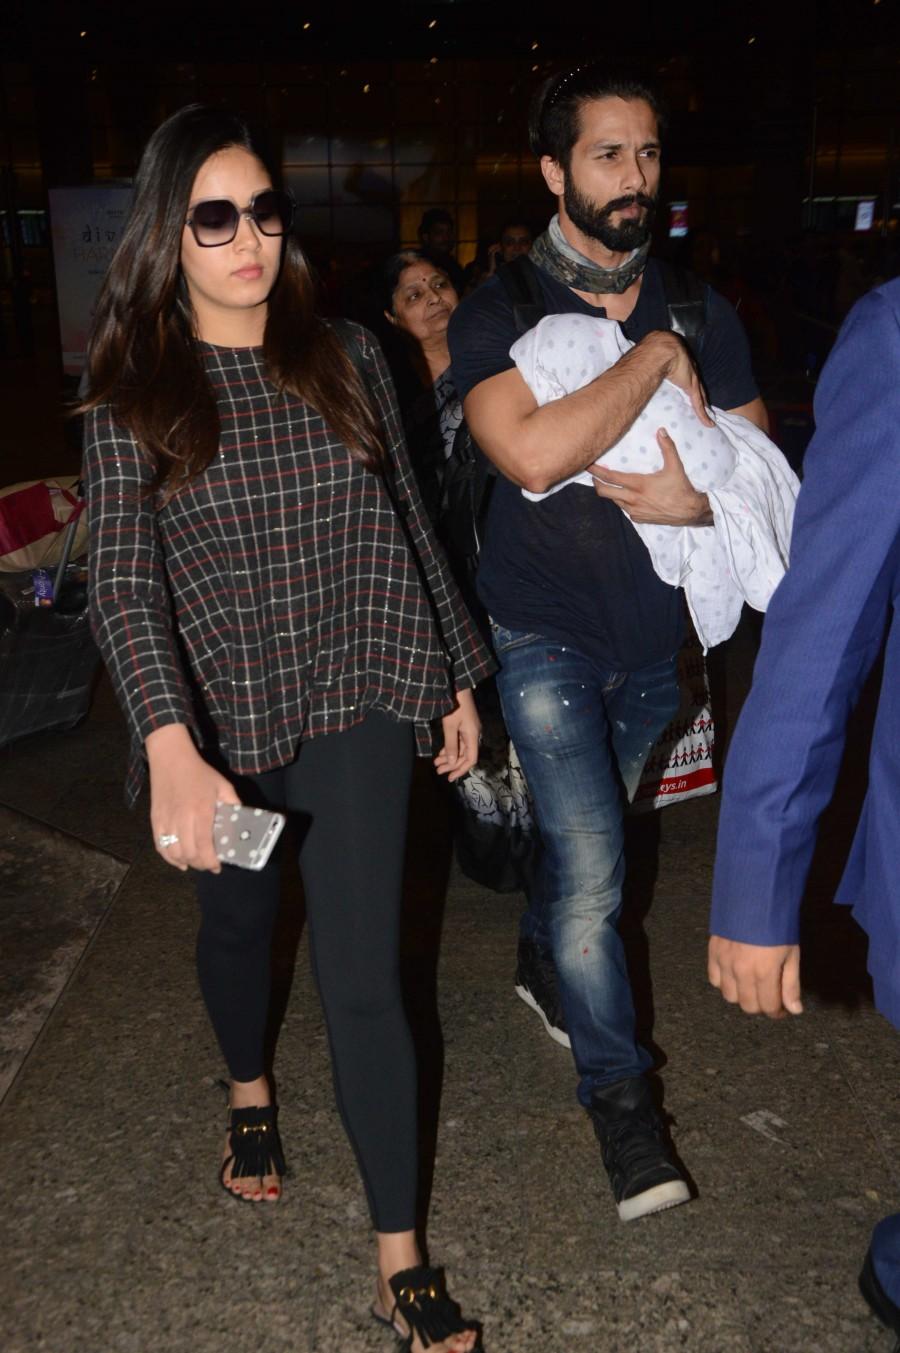 Shahid Kapoor and Mira Rajput,Shahid Kapoor,Mira Rajput,Shahid Kapoor and Mira Rajput in Airport,Shahid Kapoor and Mira Rajput spotted at Airport